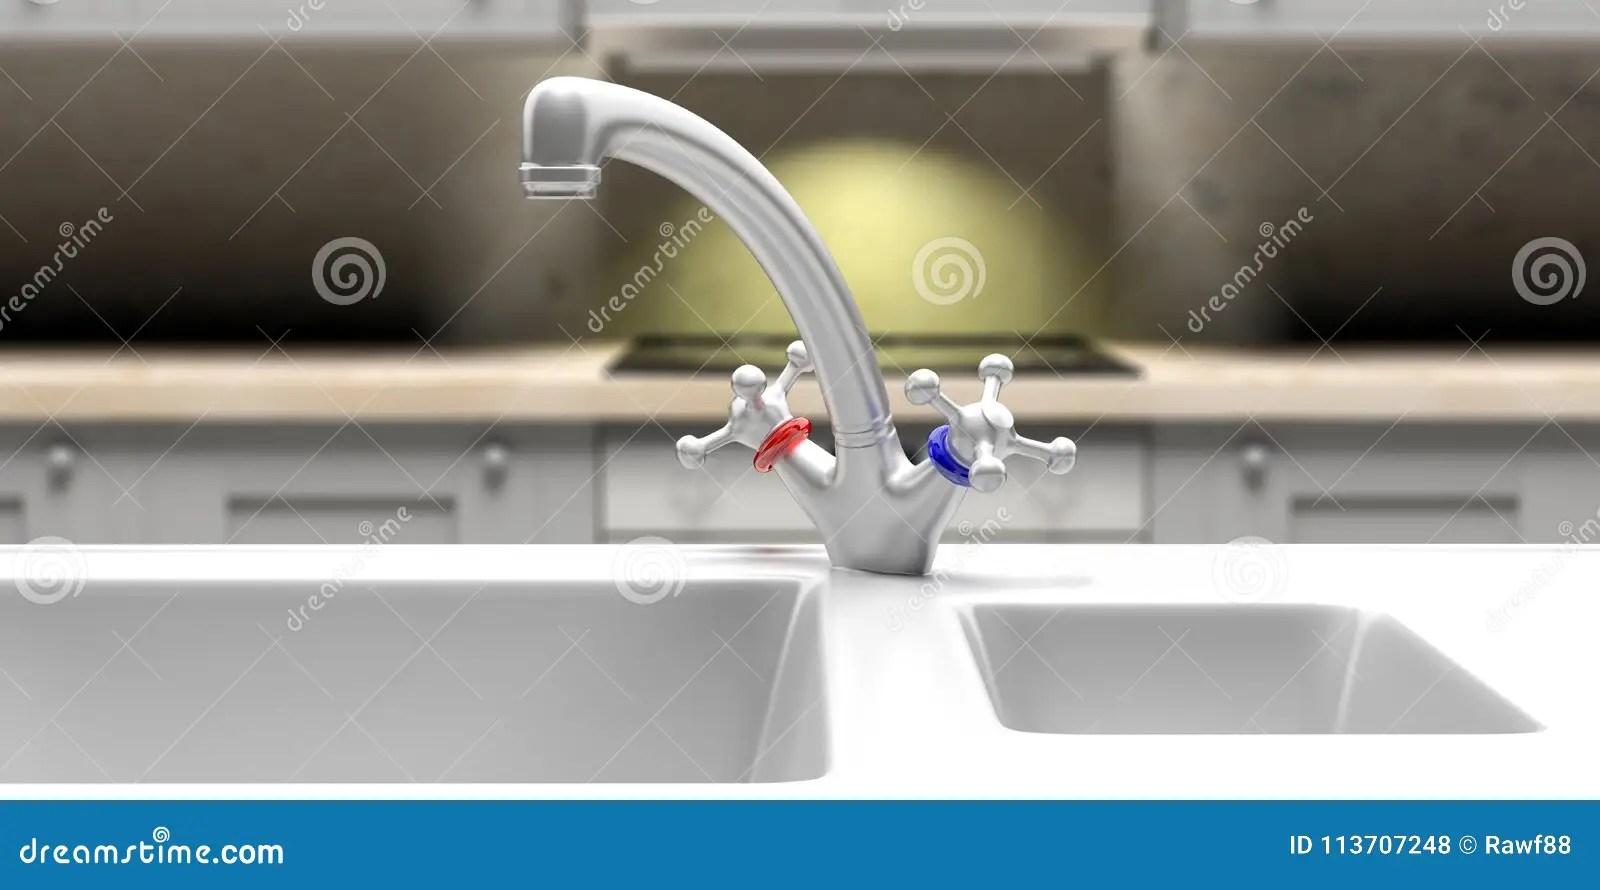 kitchen sinks and faucets birkenstock shoes 厨房水槽和水龙头特写镜头 迷离内阁和烹饪器材背景3d例证库存例证 插画 迷离内阁和烹饪器材背景3d例证